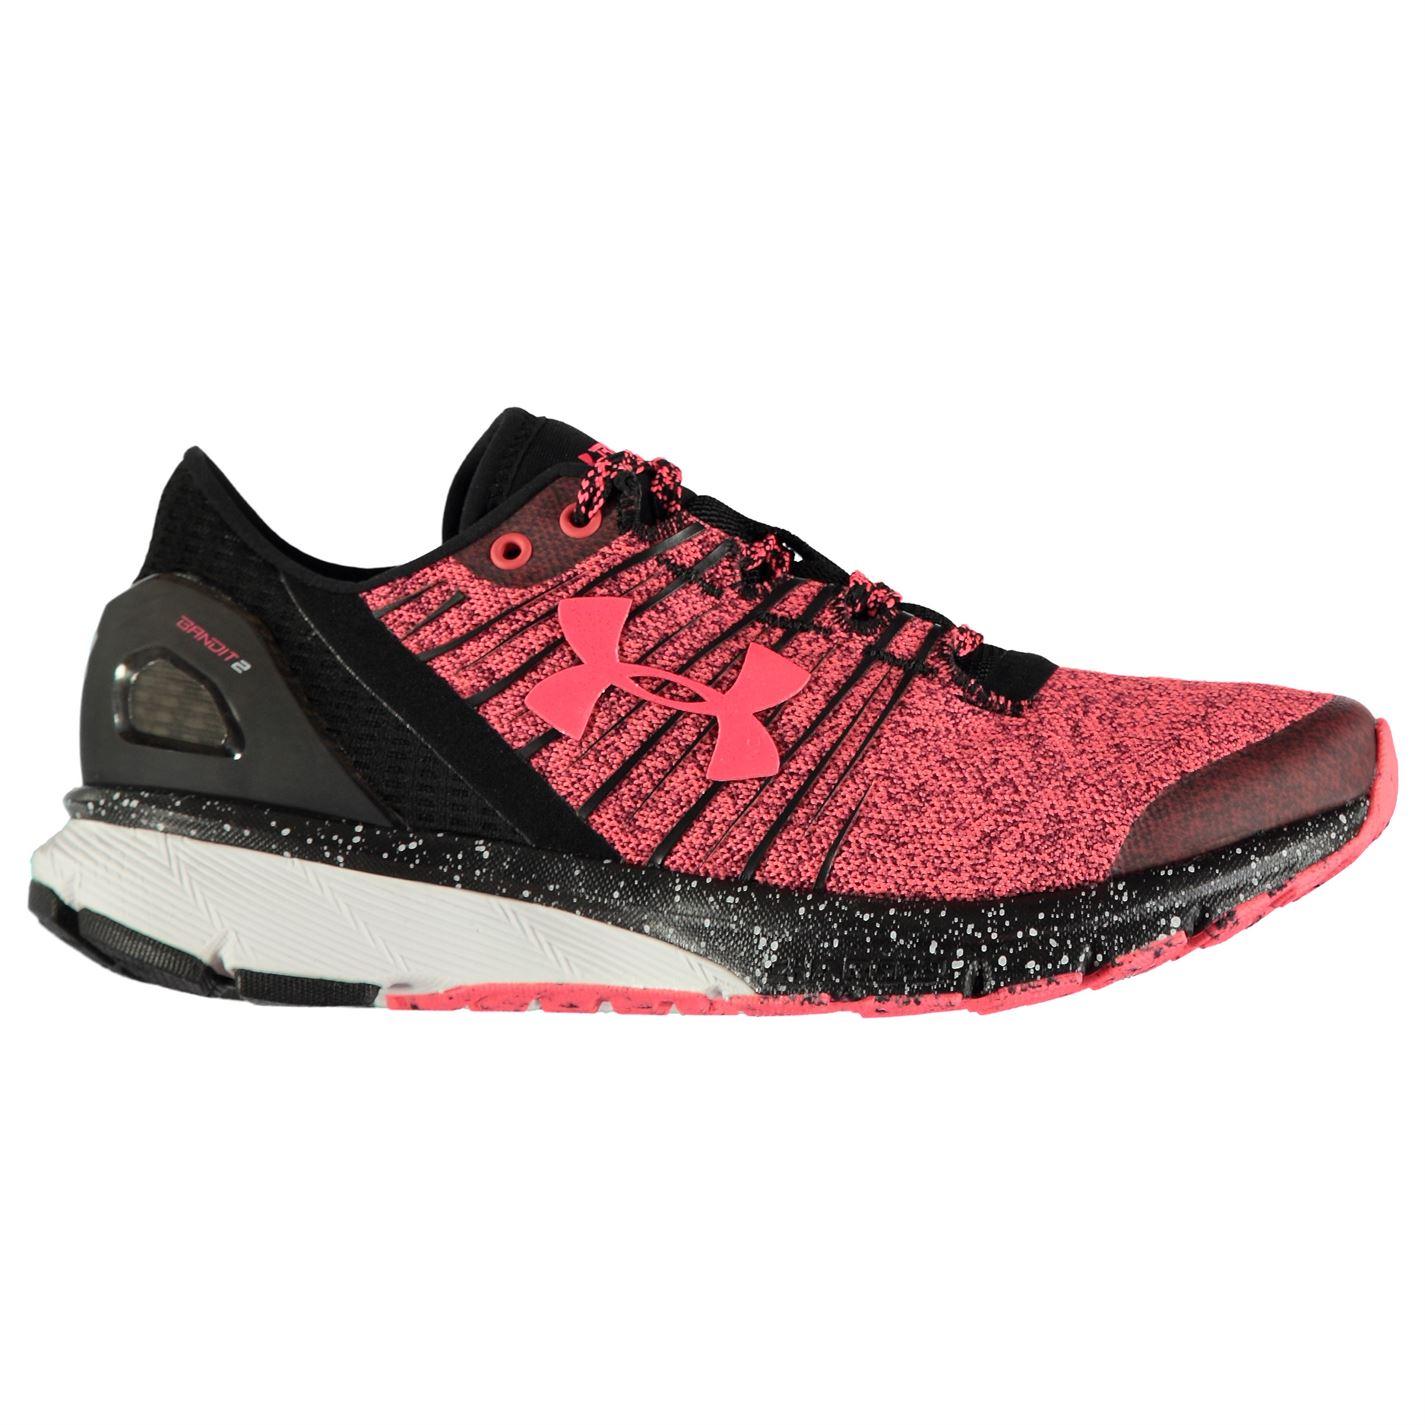 Adidasi sport Under Armour Bandit 2 pentru Femei roz